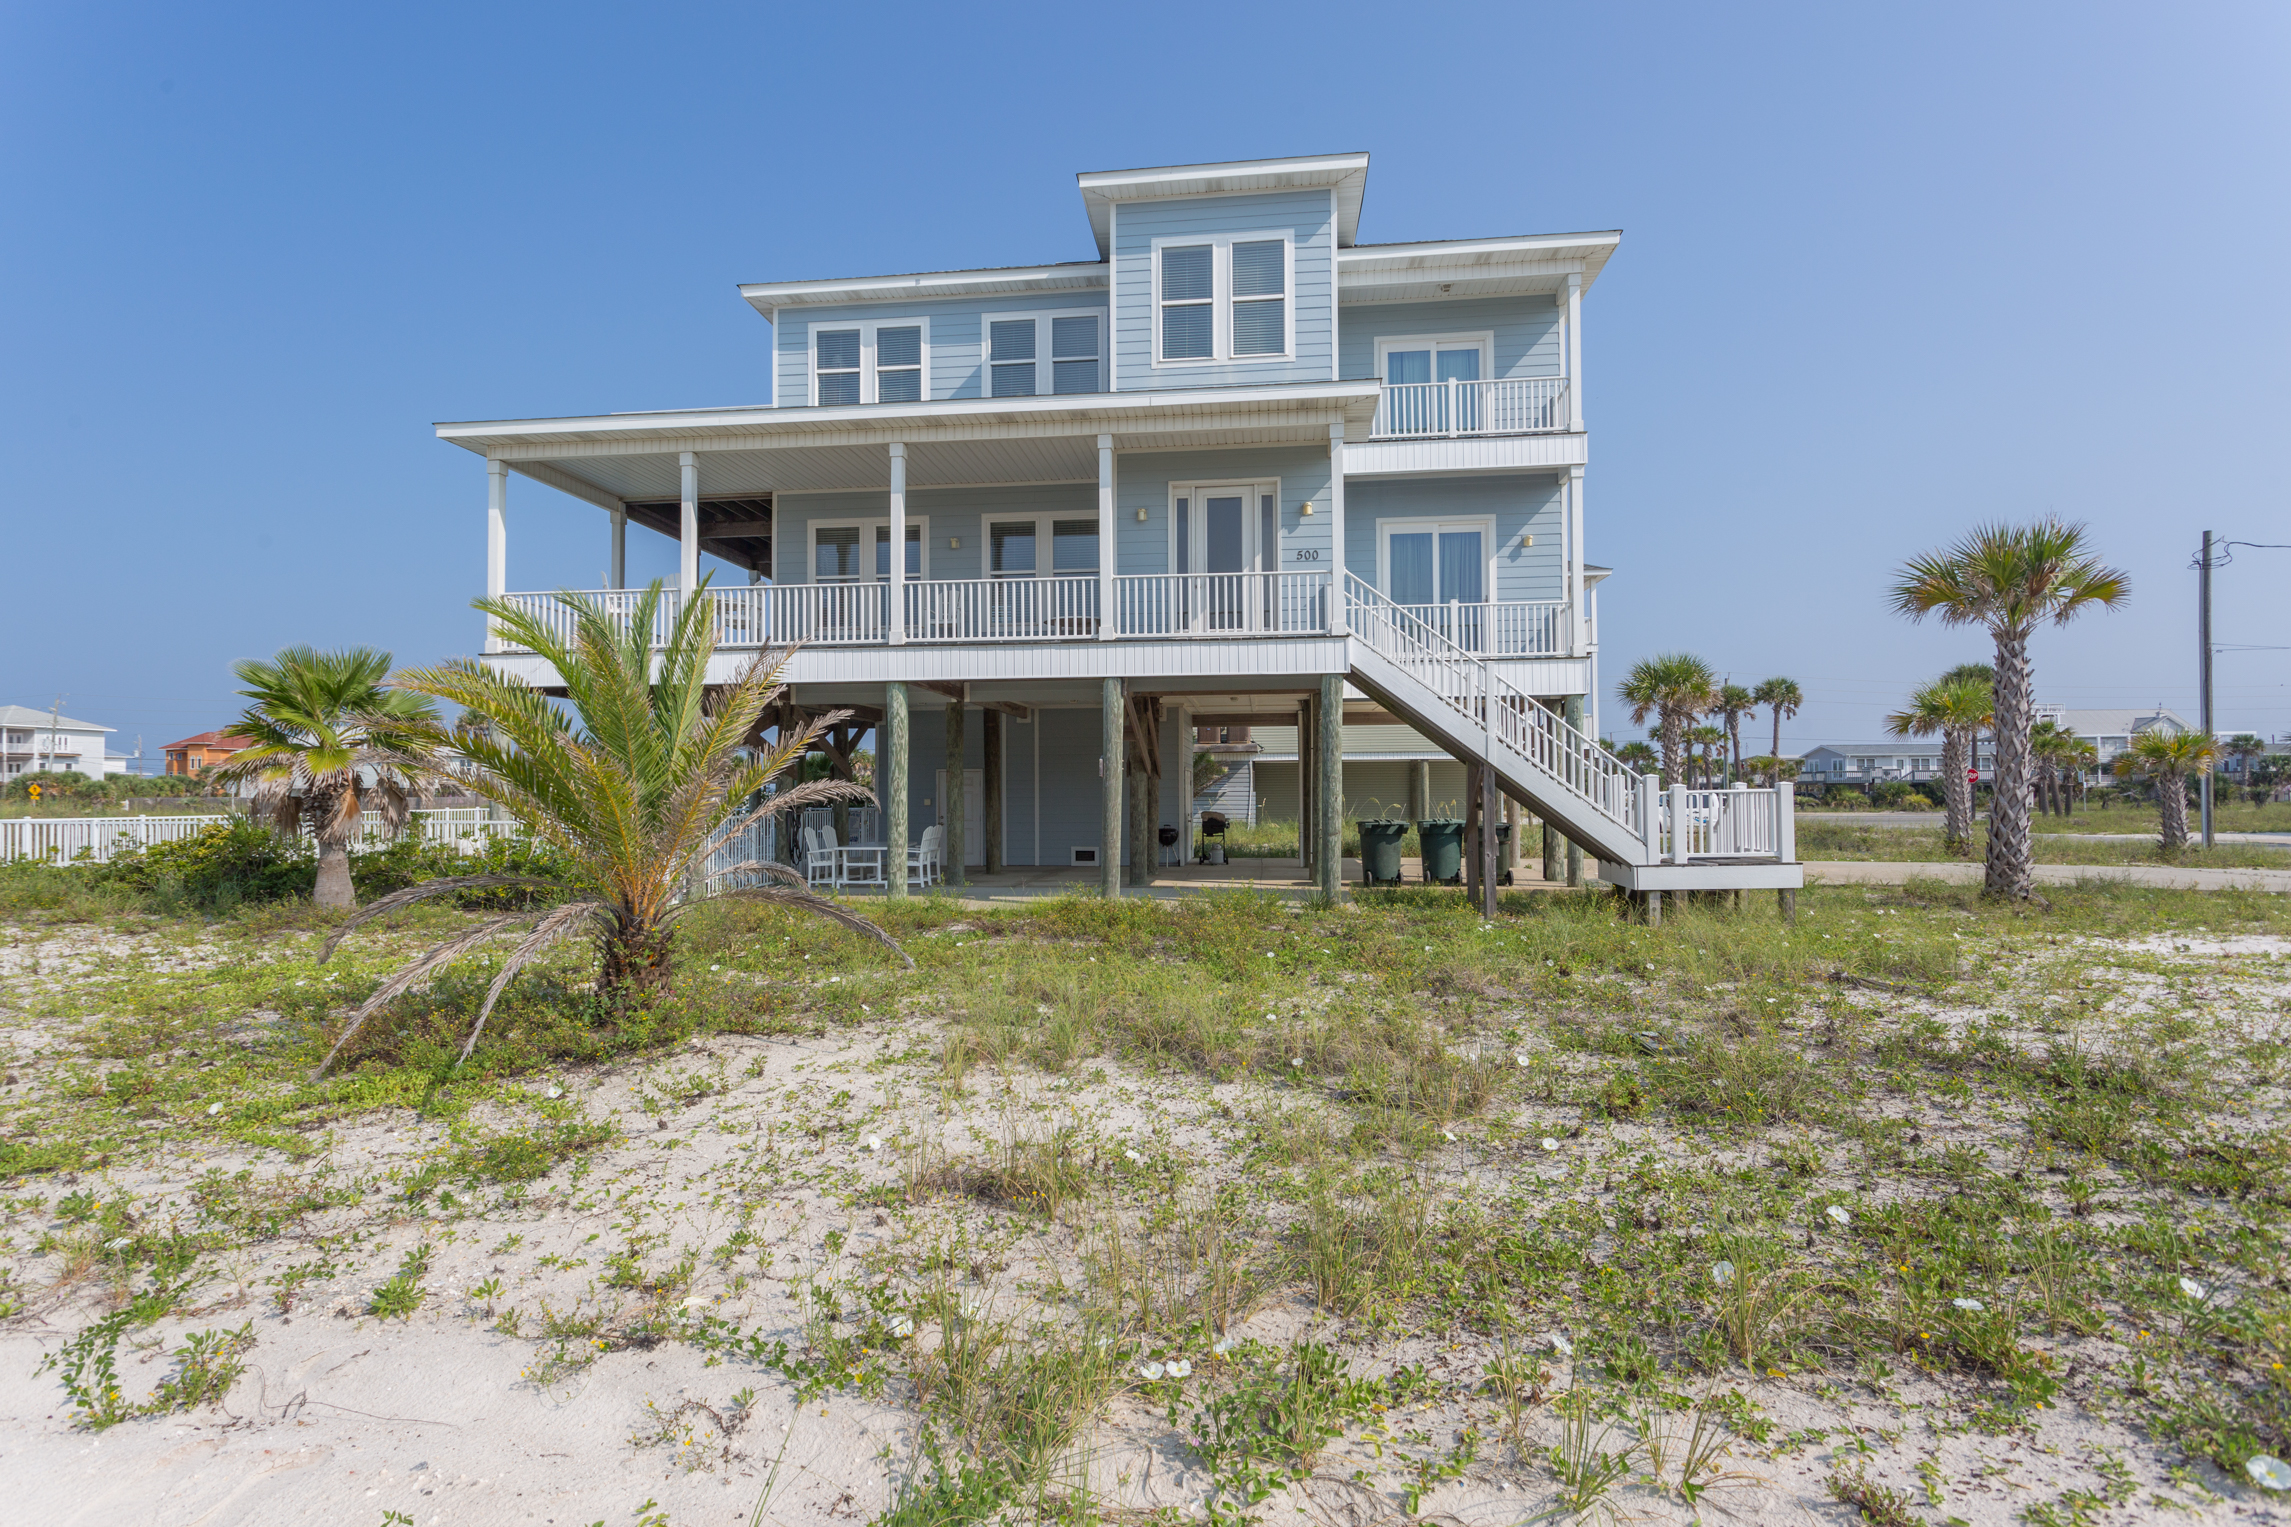 Maldonado 500 House/Cottage rental in Pensacola Beach House Rentals in Pensacola Beach Florida - #2